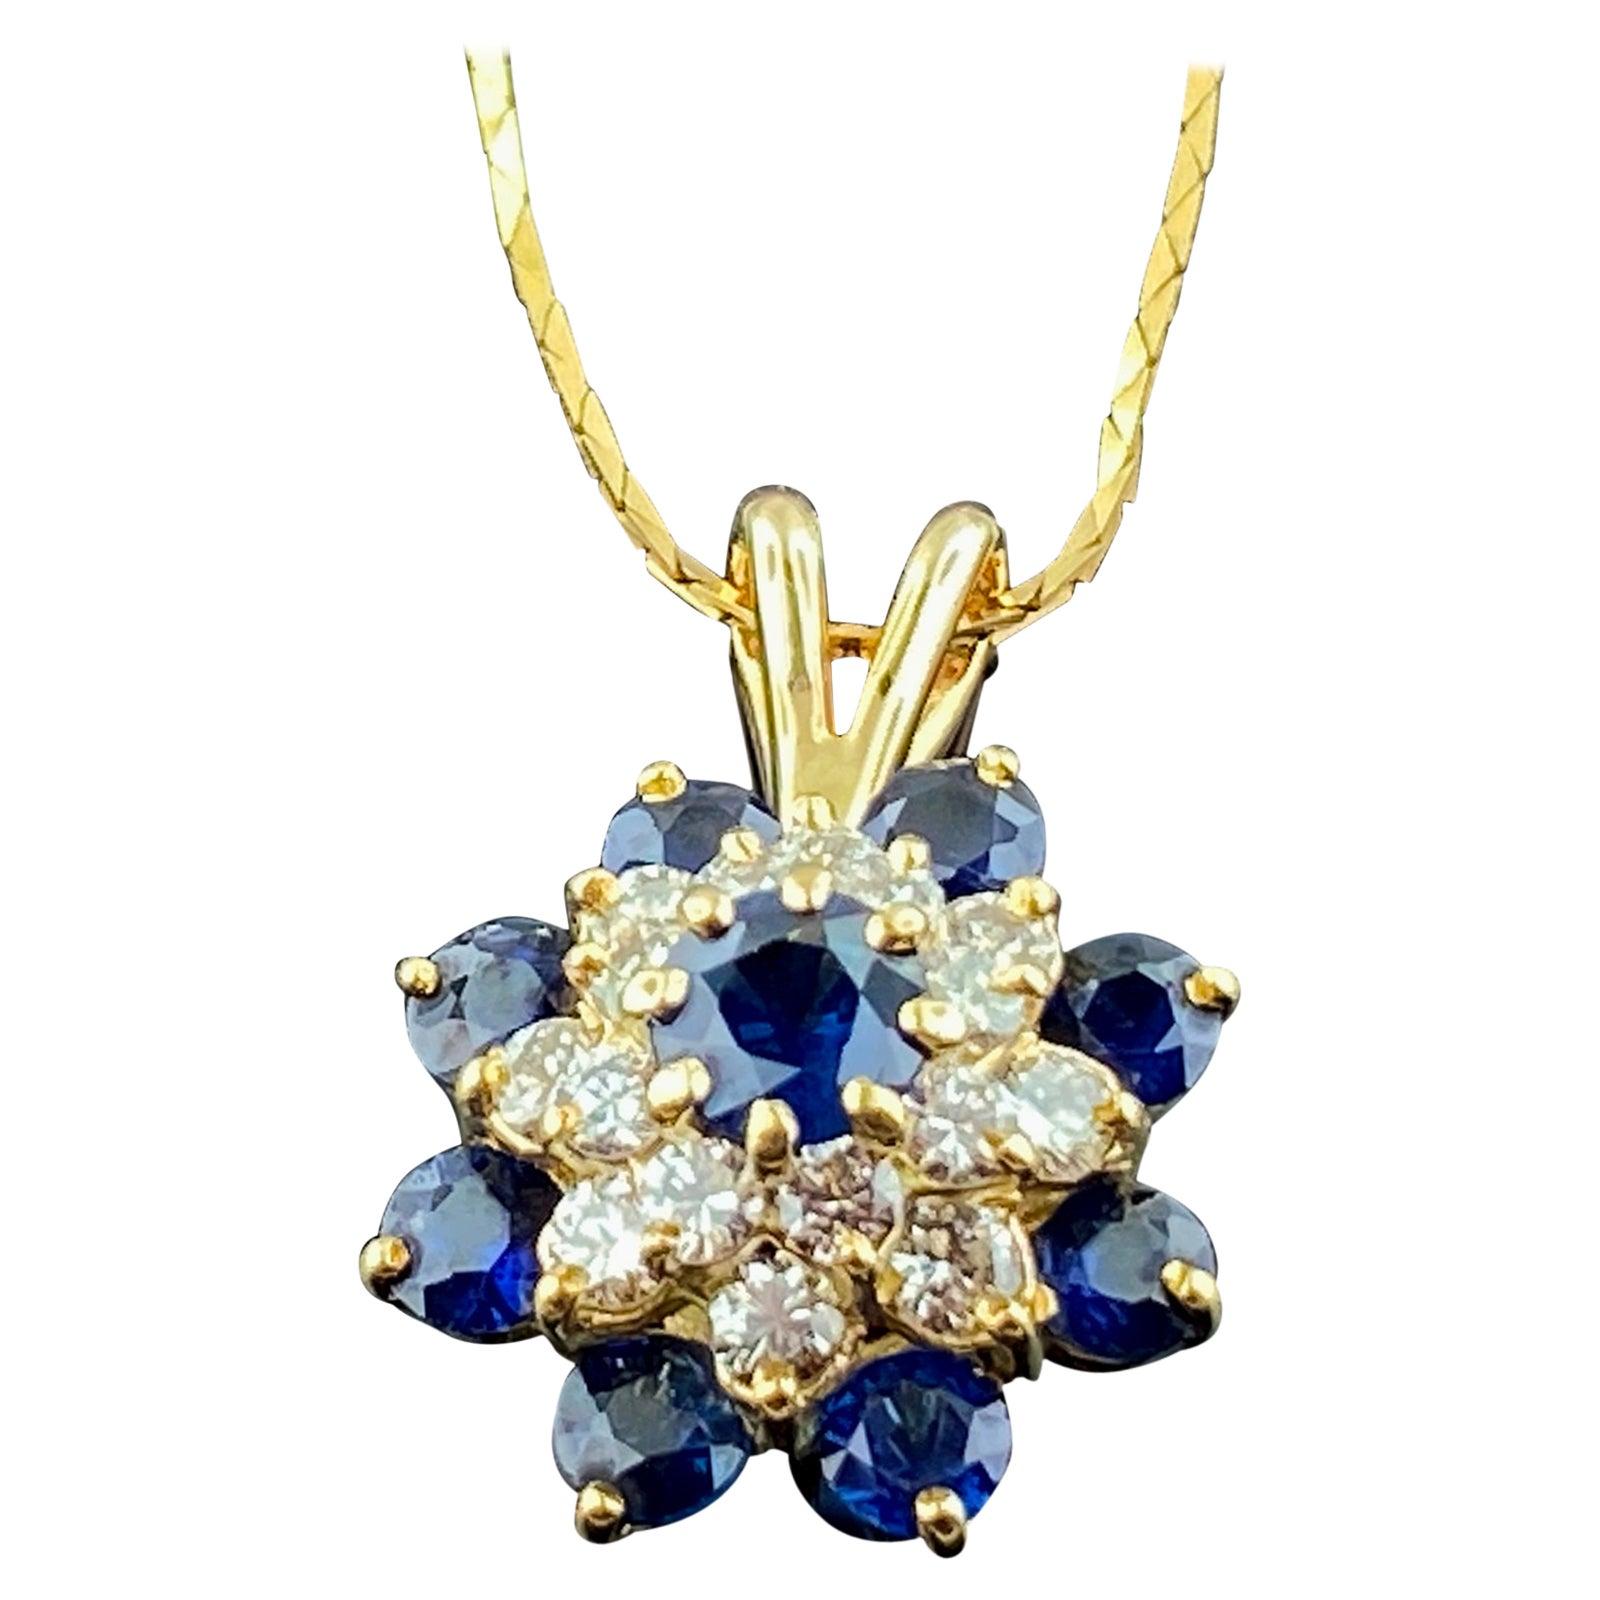 14 Karat Yellow Gold Diamond and Blue Sapphire Pendant